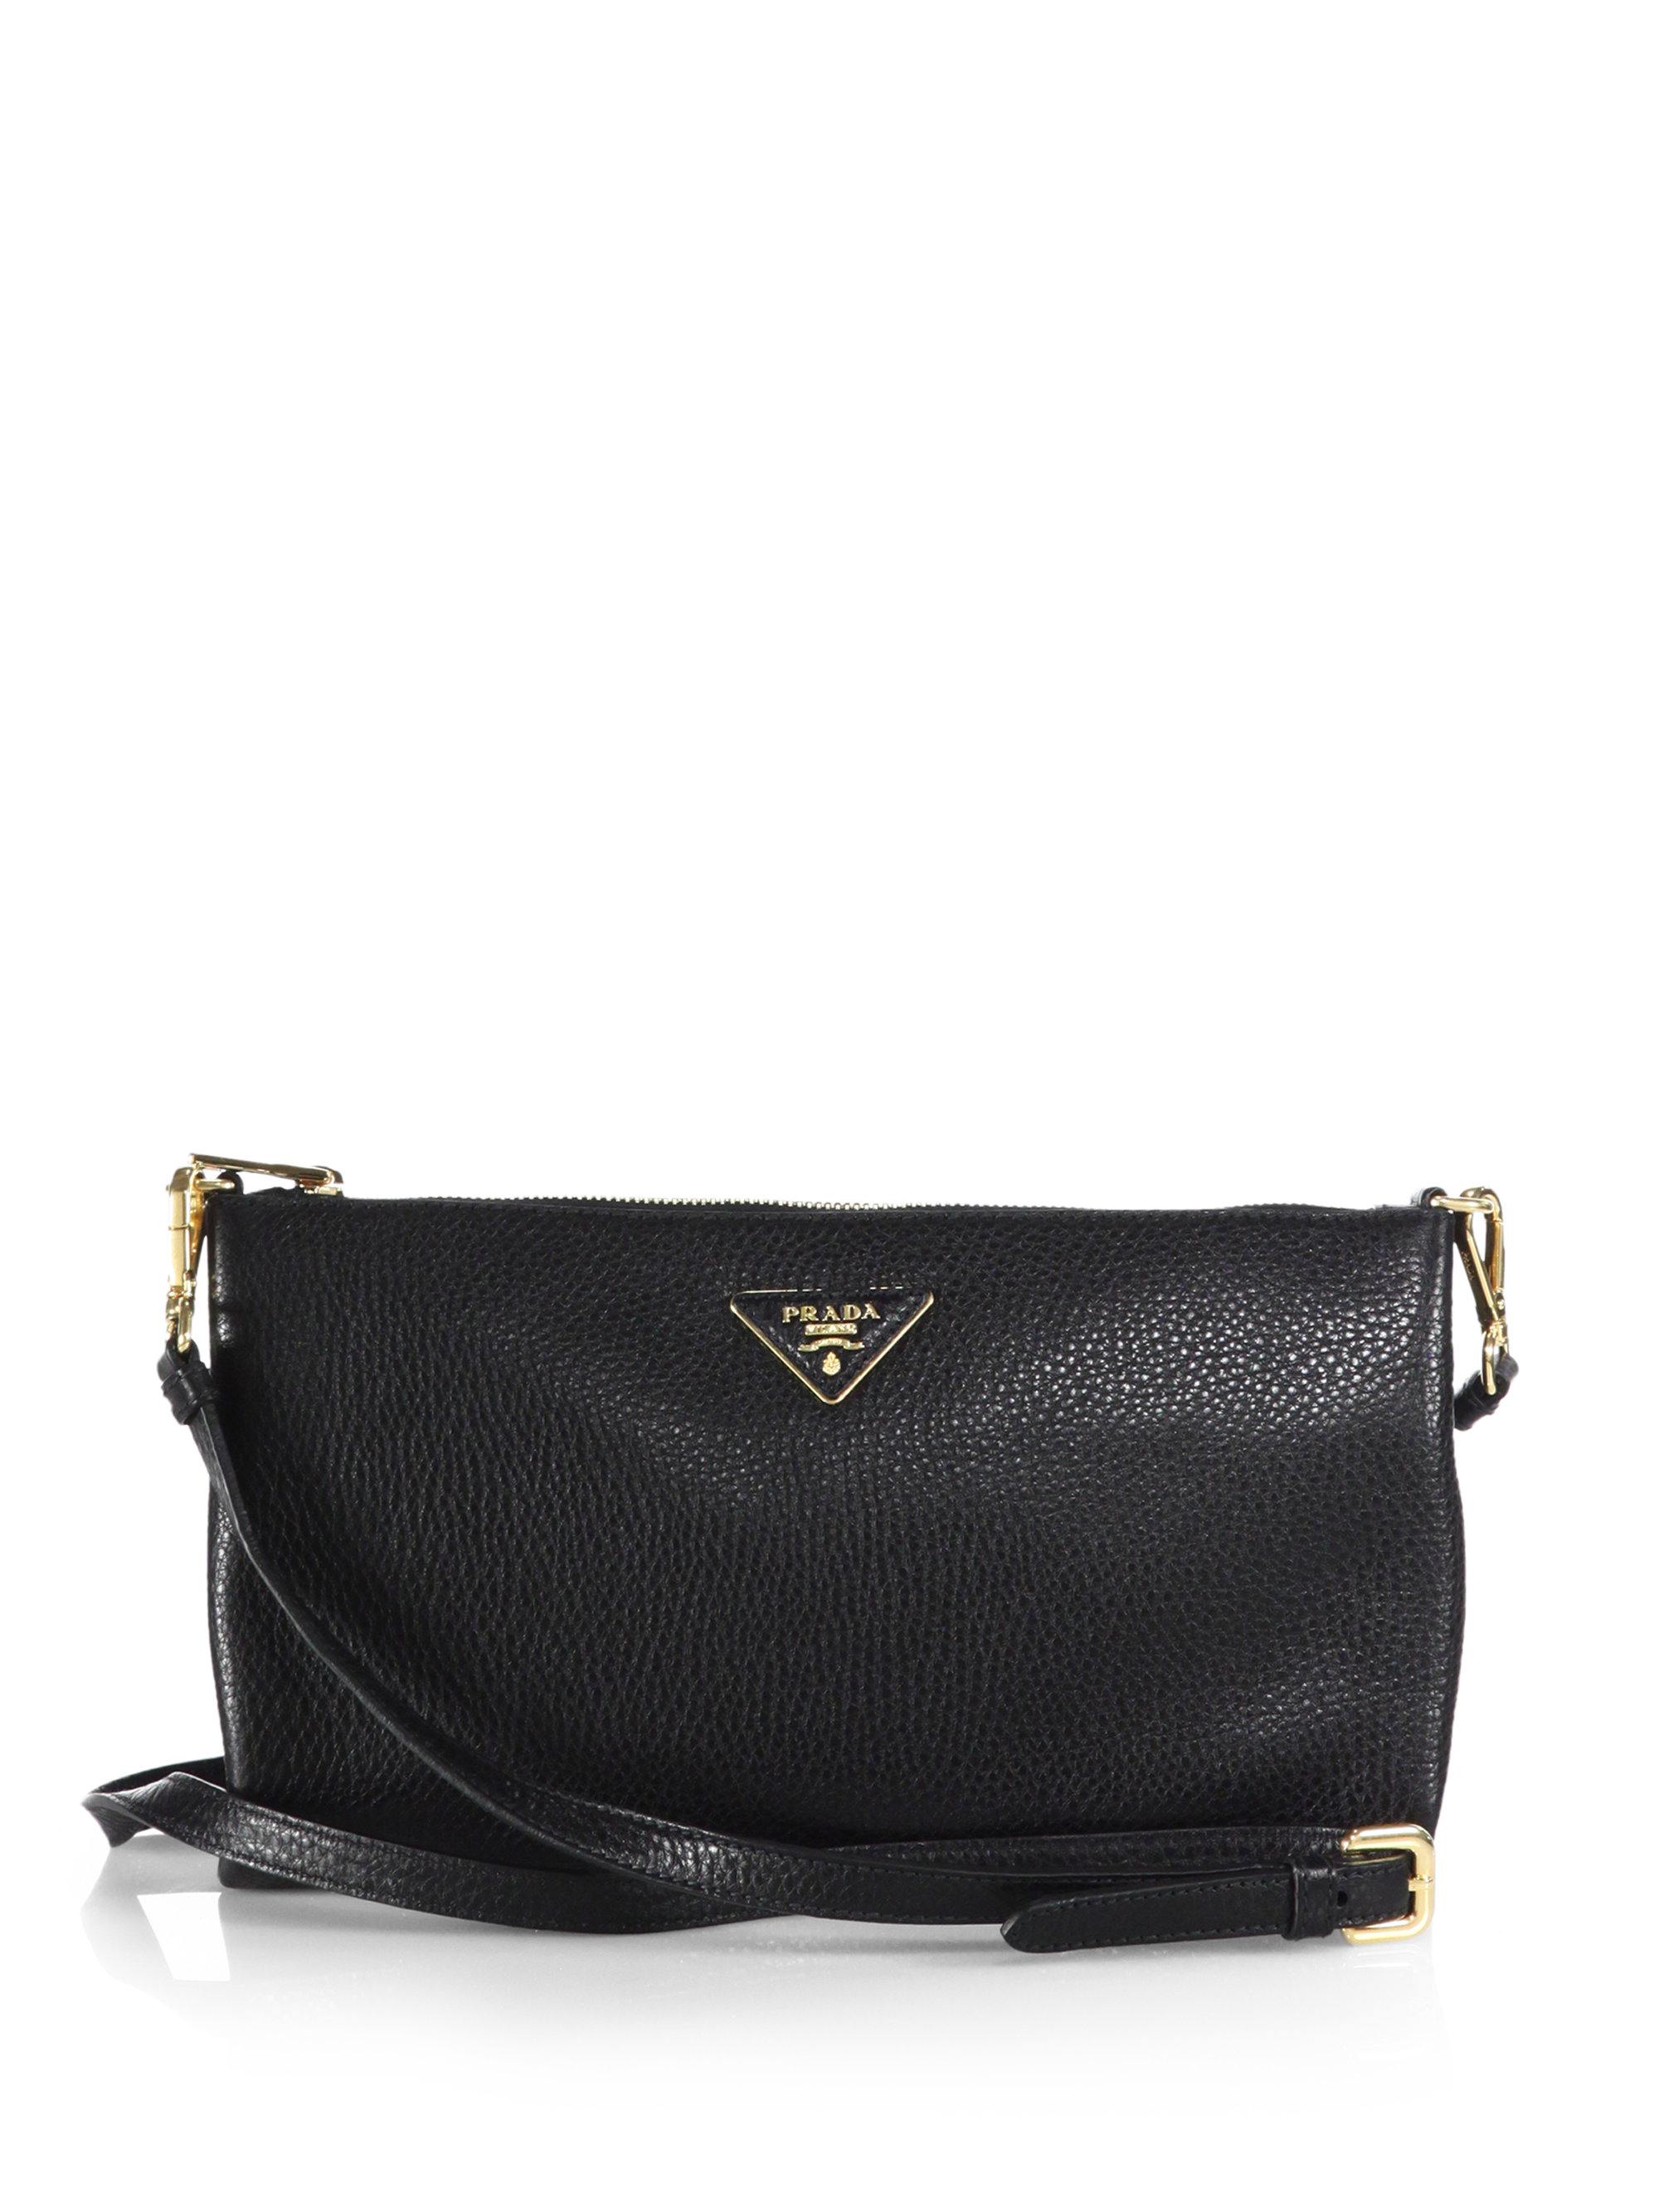 5c878dfc5716 cheap lyst prada daino crossbody bag in black b802c 96c3e